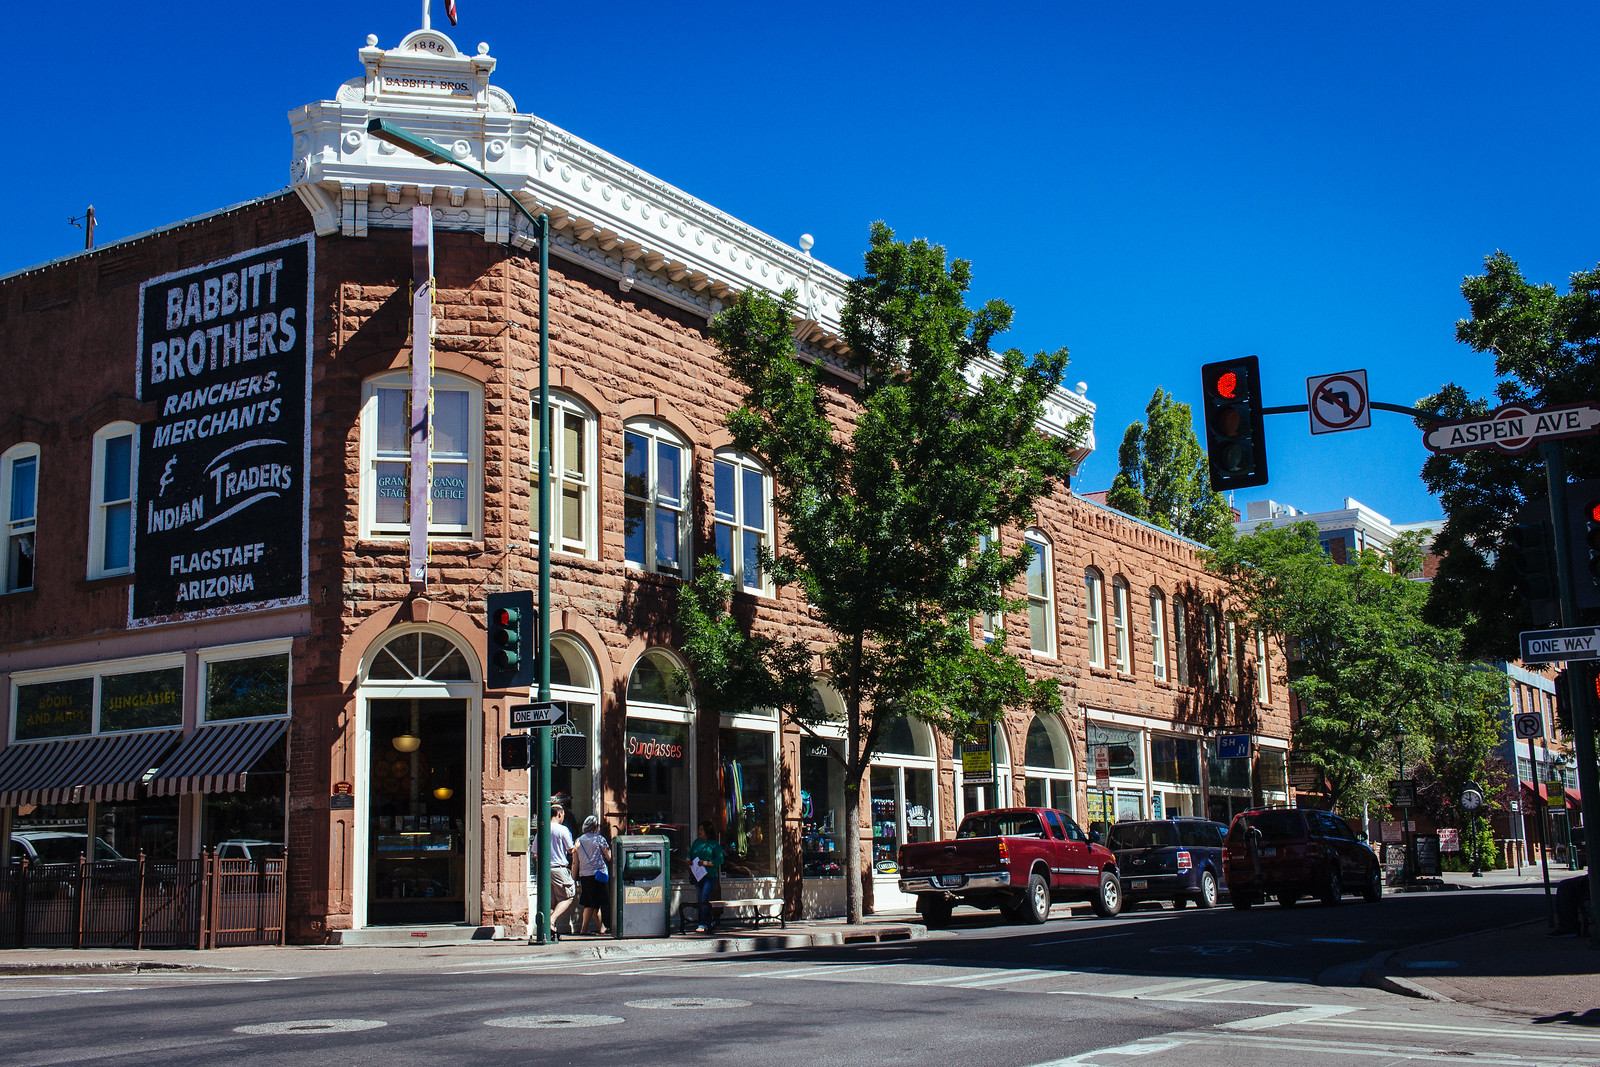 Historic stone storefront on a treelined downtown street in Flagstaff, Arizona